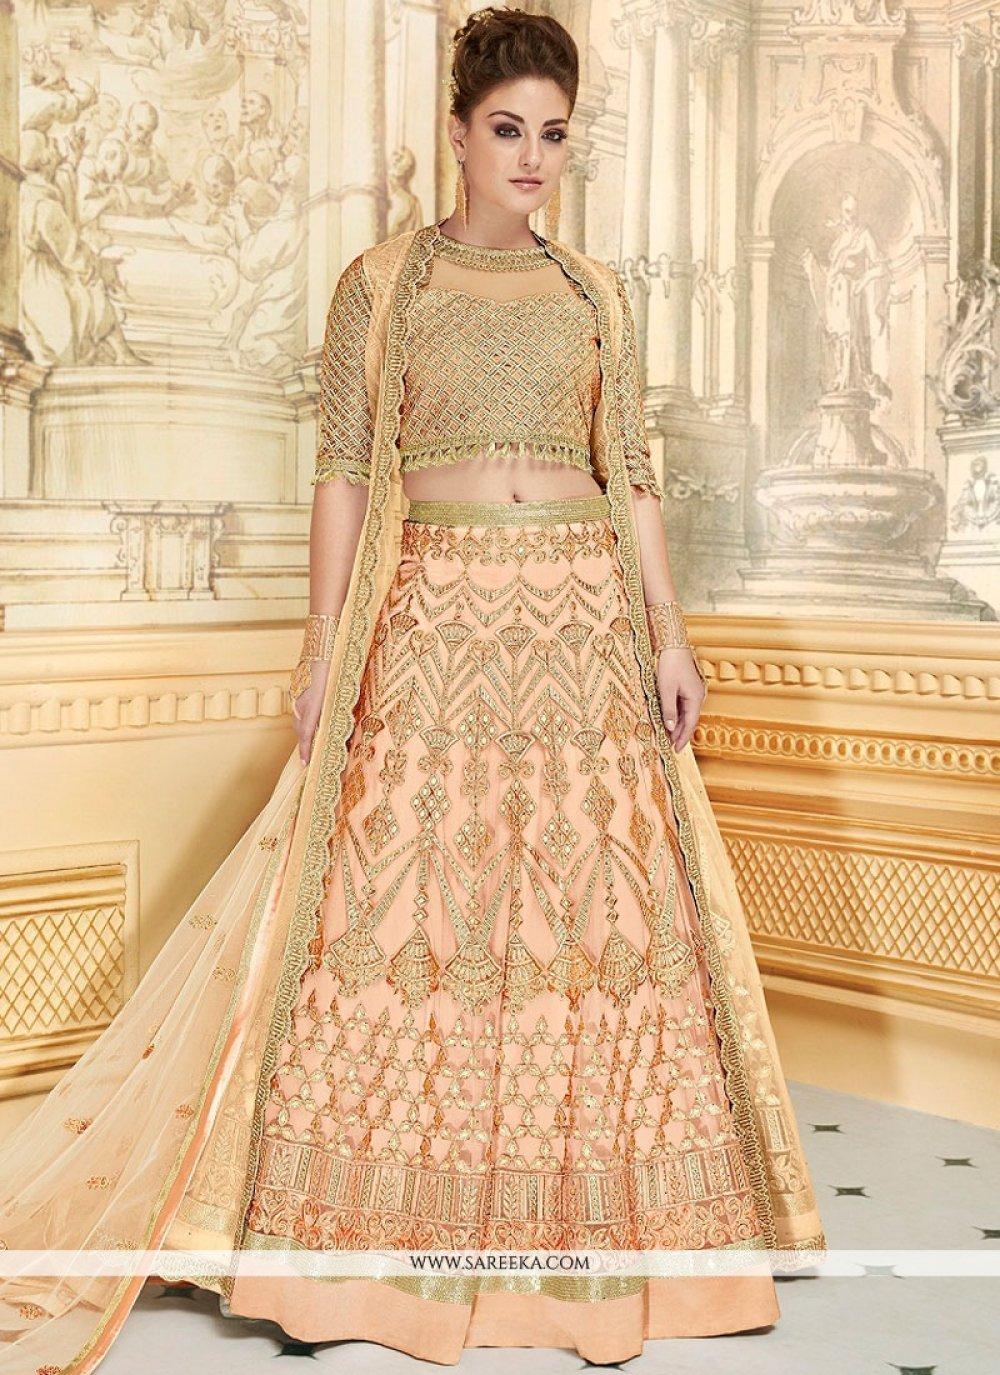 Fancy Fabric Peach Lace Work Lehenga Choli